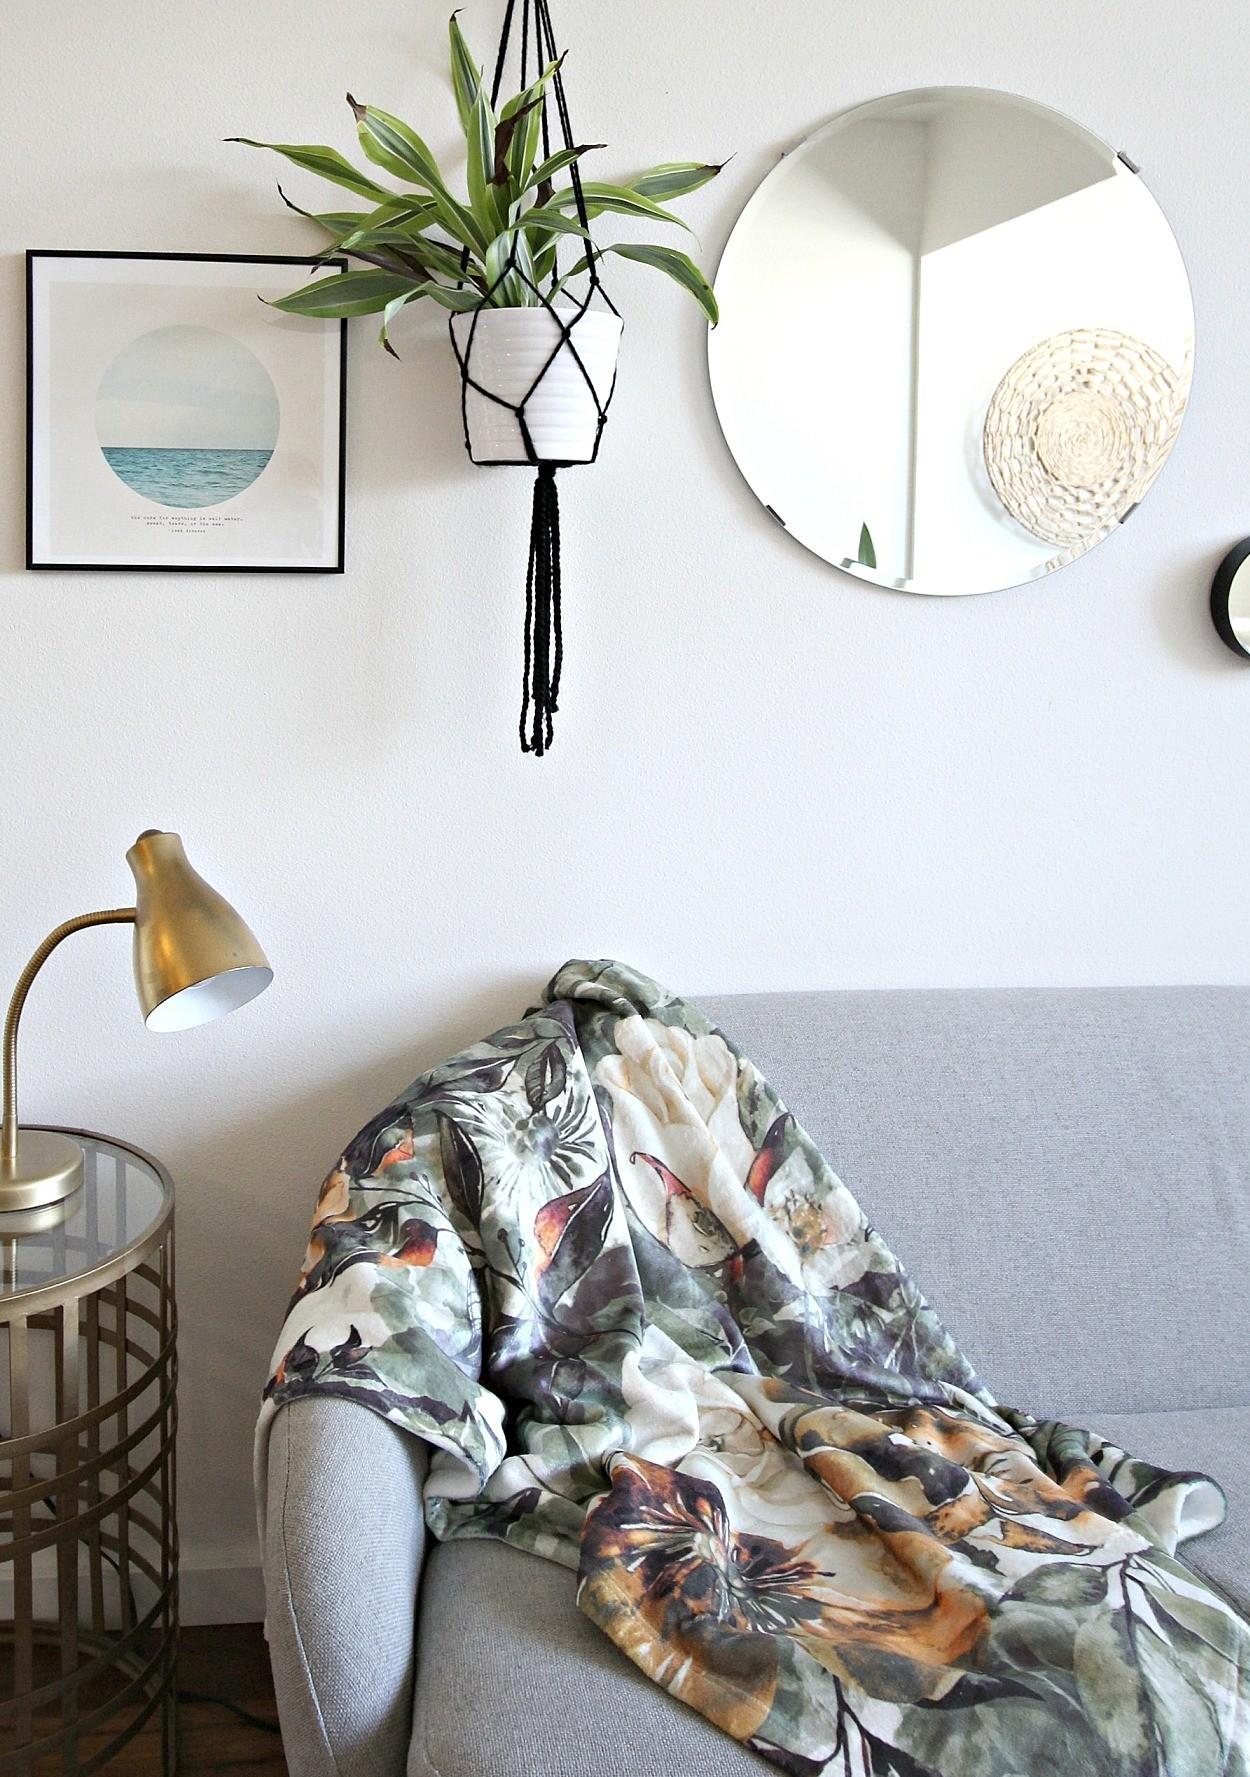 6 Amazing Decor Ideas for Your Rental Apartment | Martha Stewart